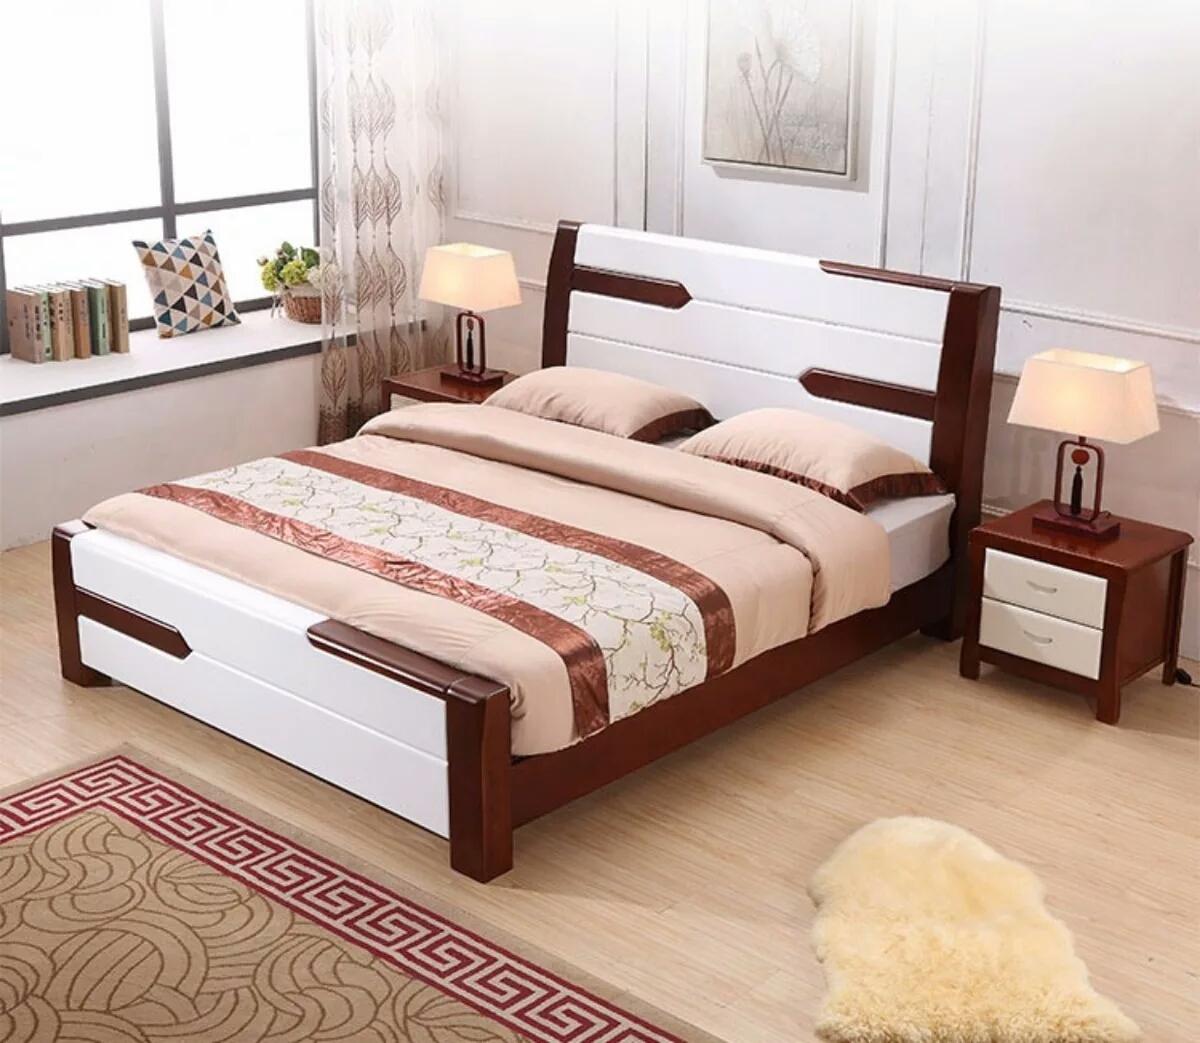 Shipping all wood 1.8 meters 1.5 meters 1.2 meters of oak bed double bed children simple wooden bed